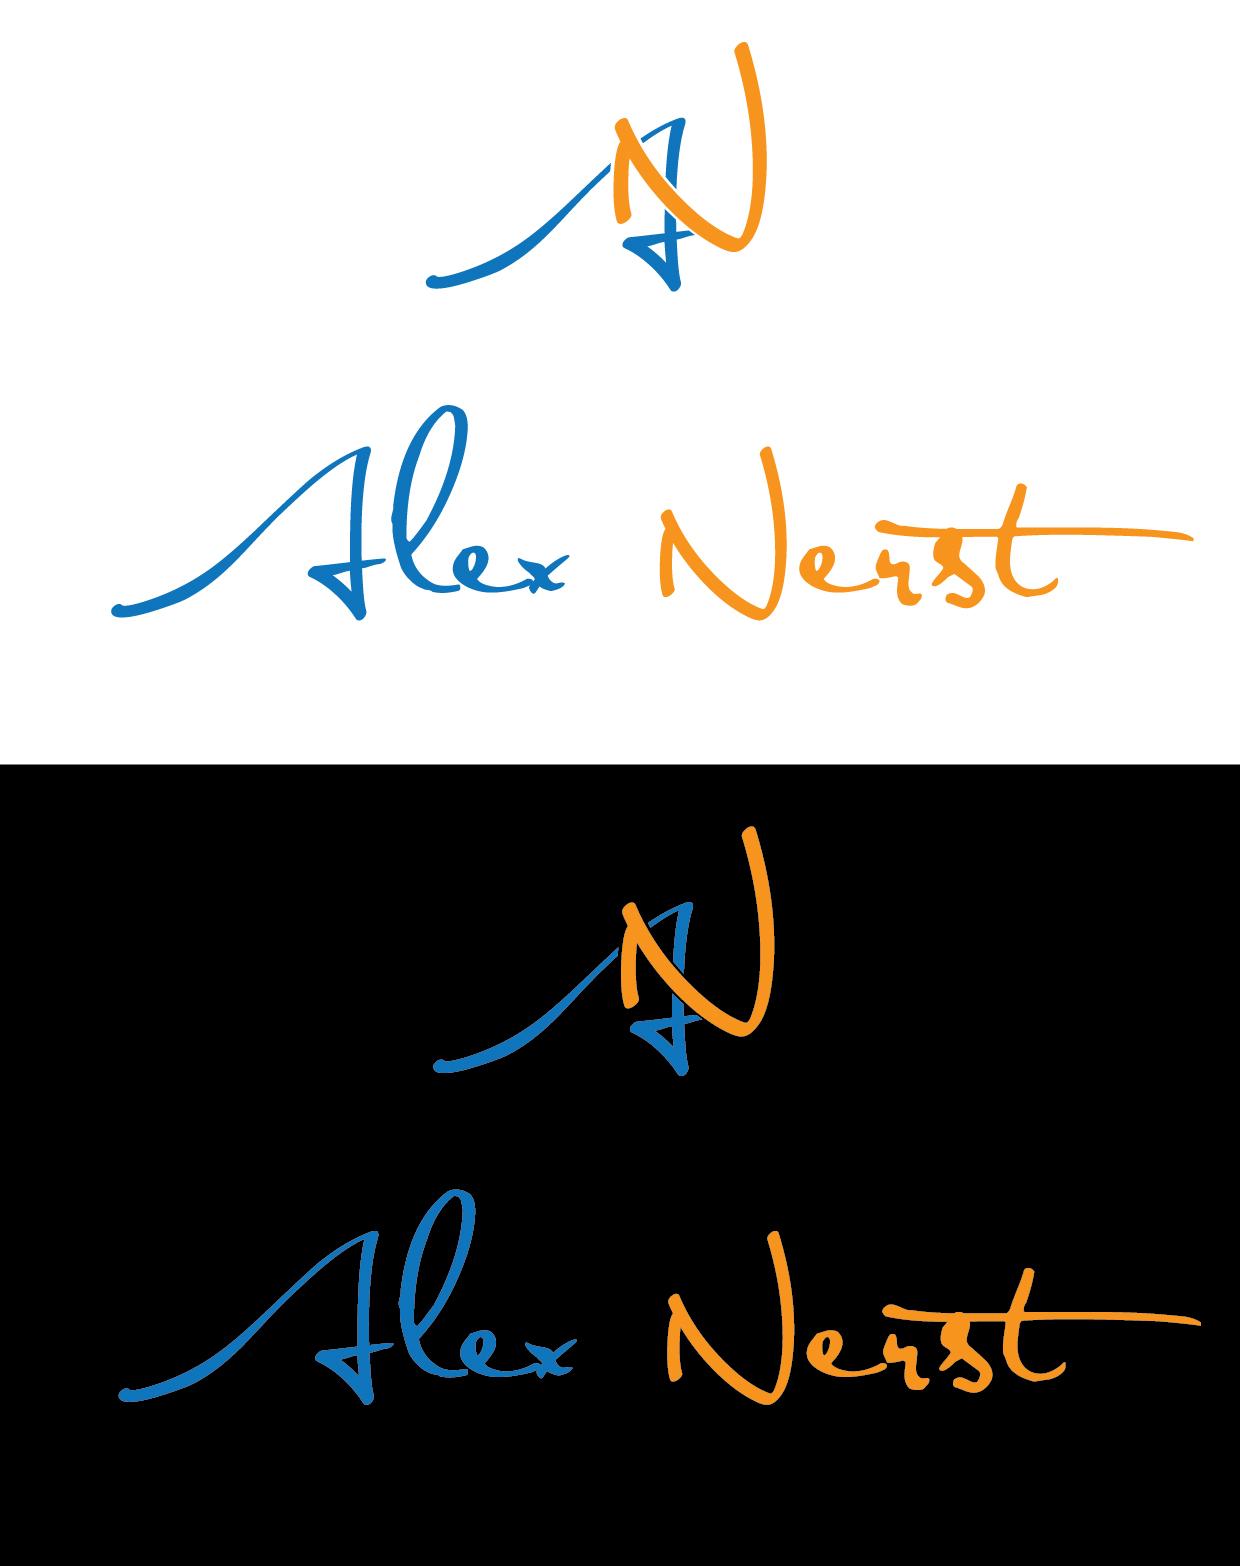 Logo Design by Petar Kovachev - Entry No. 49 in the Logo Design Contest Artistic Logo Design for Alex Nerst.